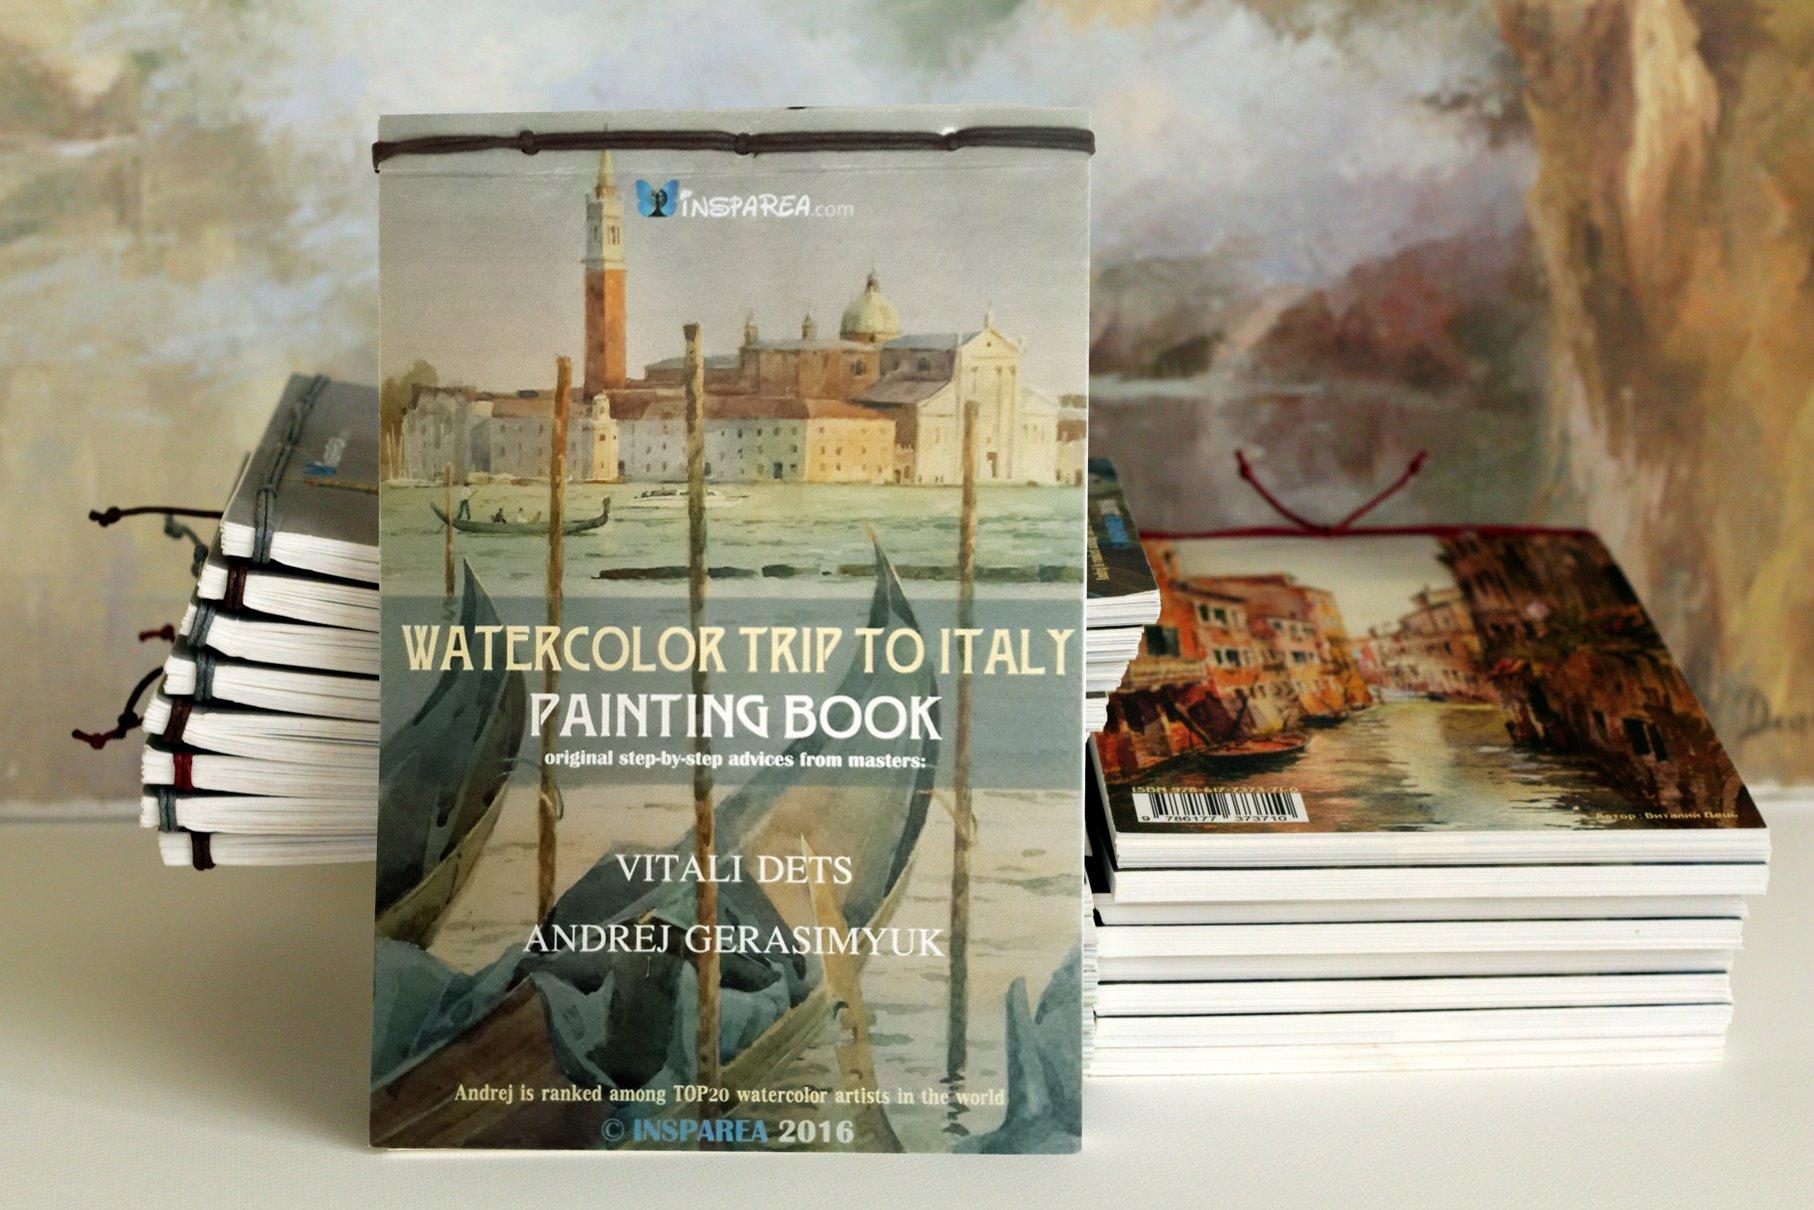 Watercolor artist magazine subscription - Watercolor Trip To Italy Painting_book Vitali Dets Andrej Gerasimyuk 9786177373901 Amazon Com Books